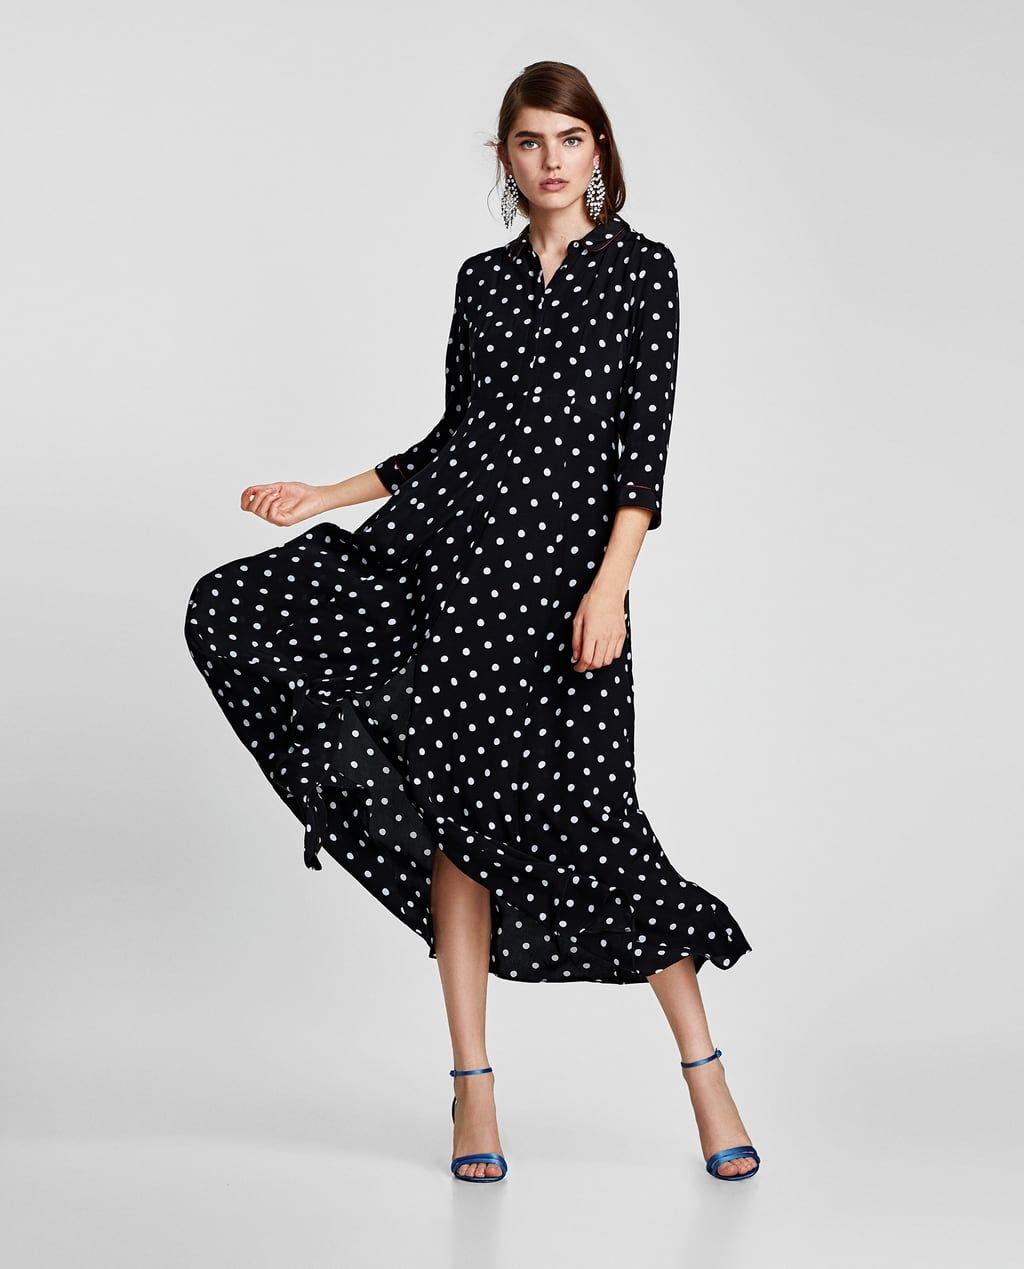 zara - woman - long polka dot dress | abiti a pois, vestito